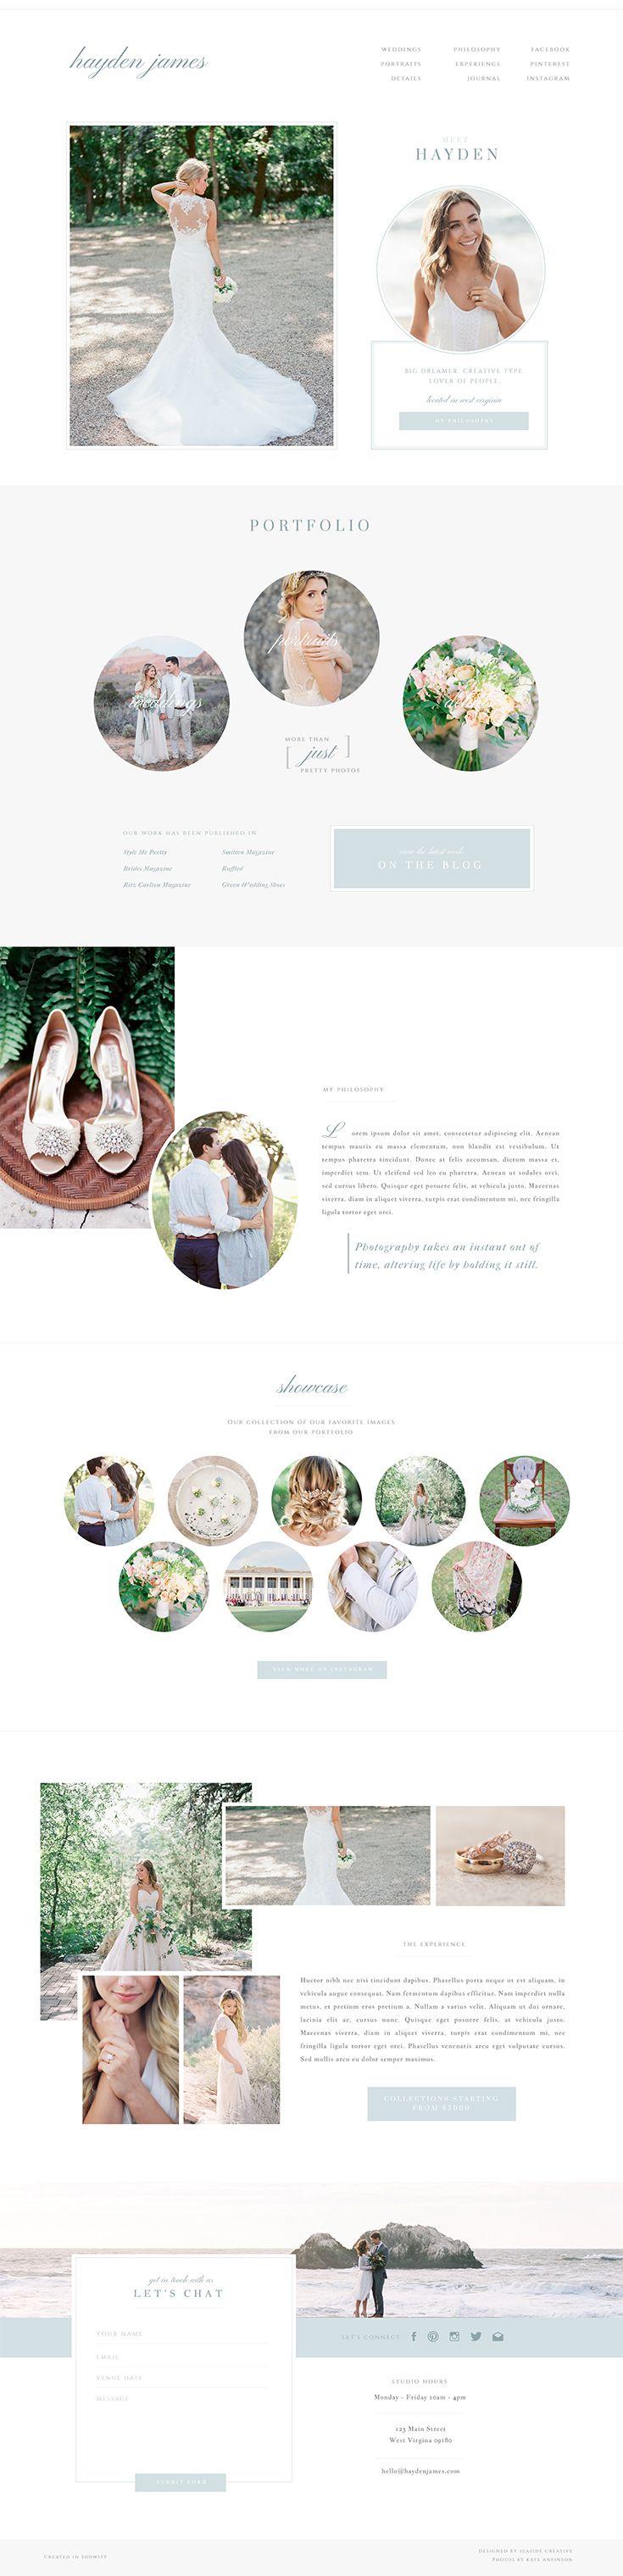 Hayden Showit 5 Website Template Design.   Romantic, Coastal, Beautiful, Airy, Light